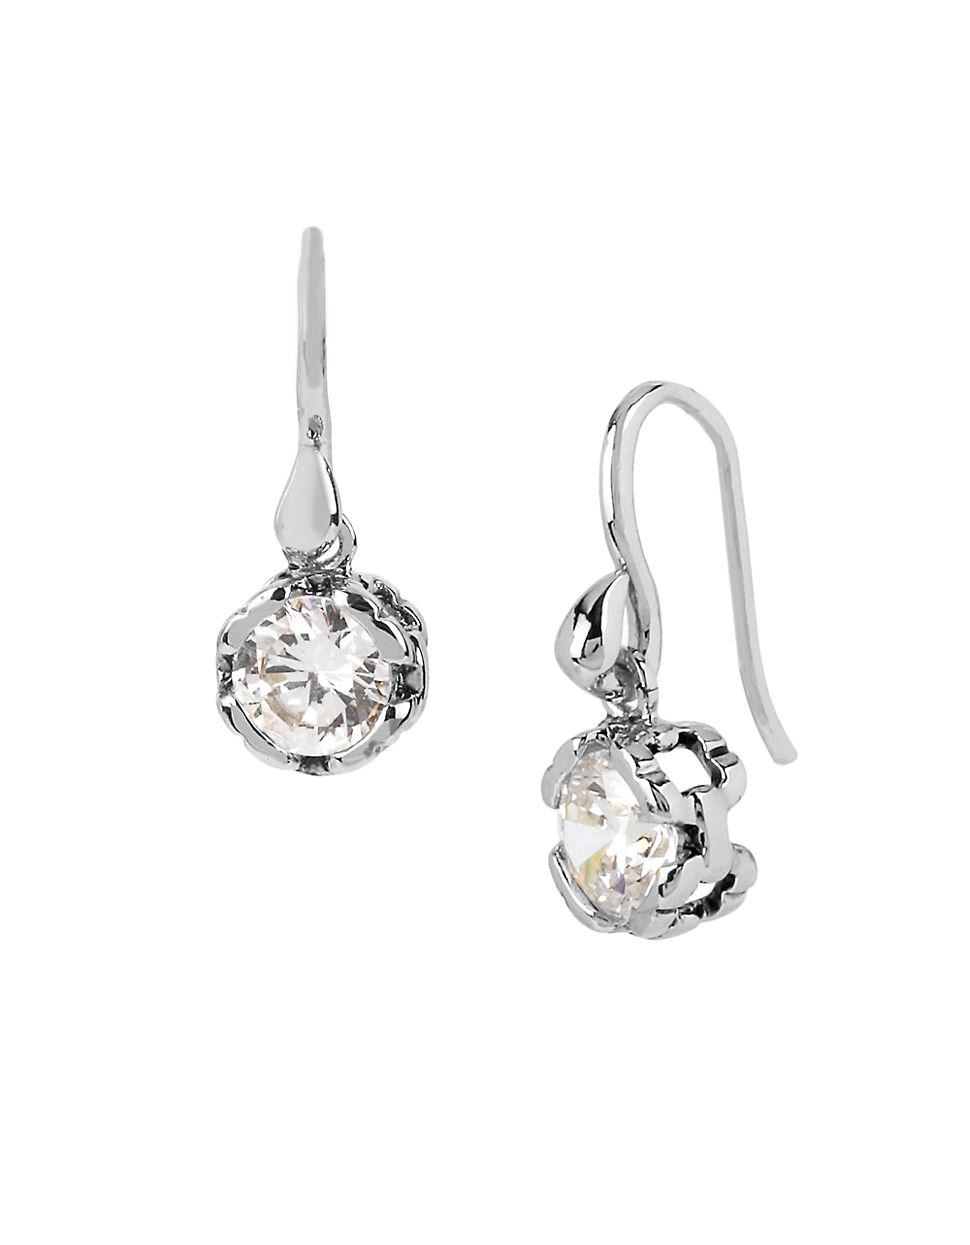 Diane von furstenberg Cubism Cubic Zirconia Drop Earrings